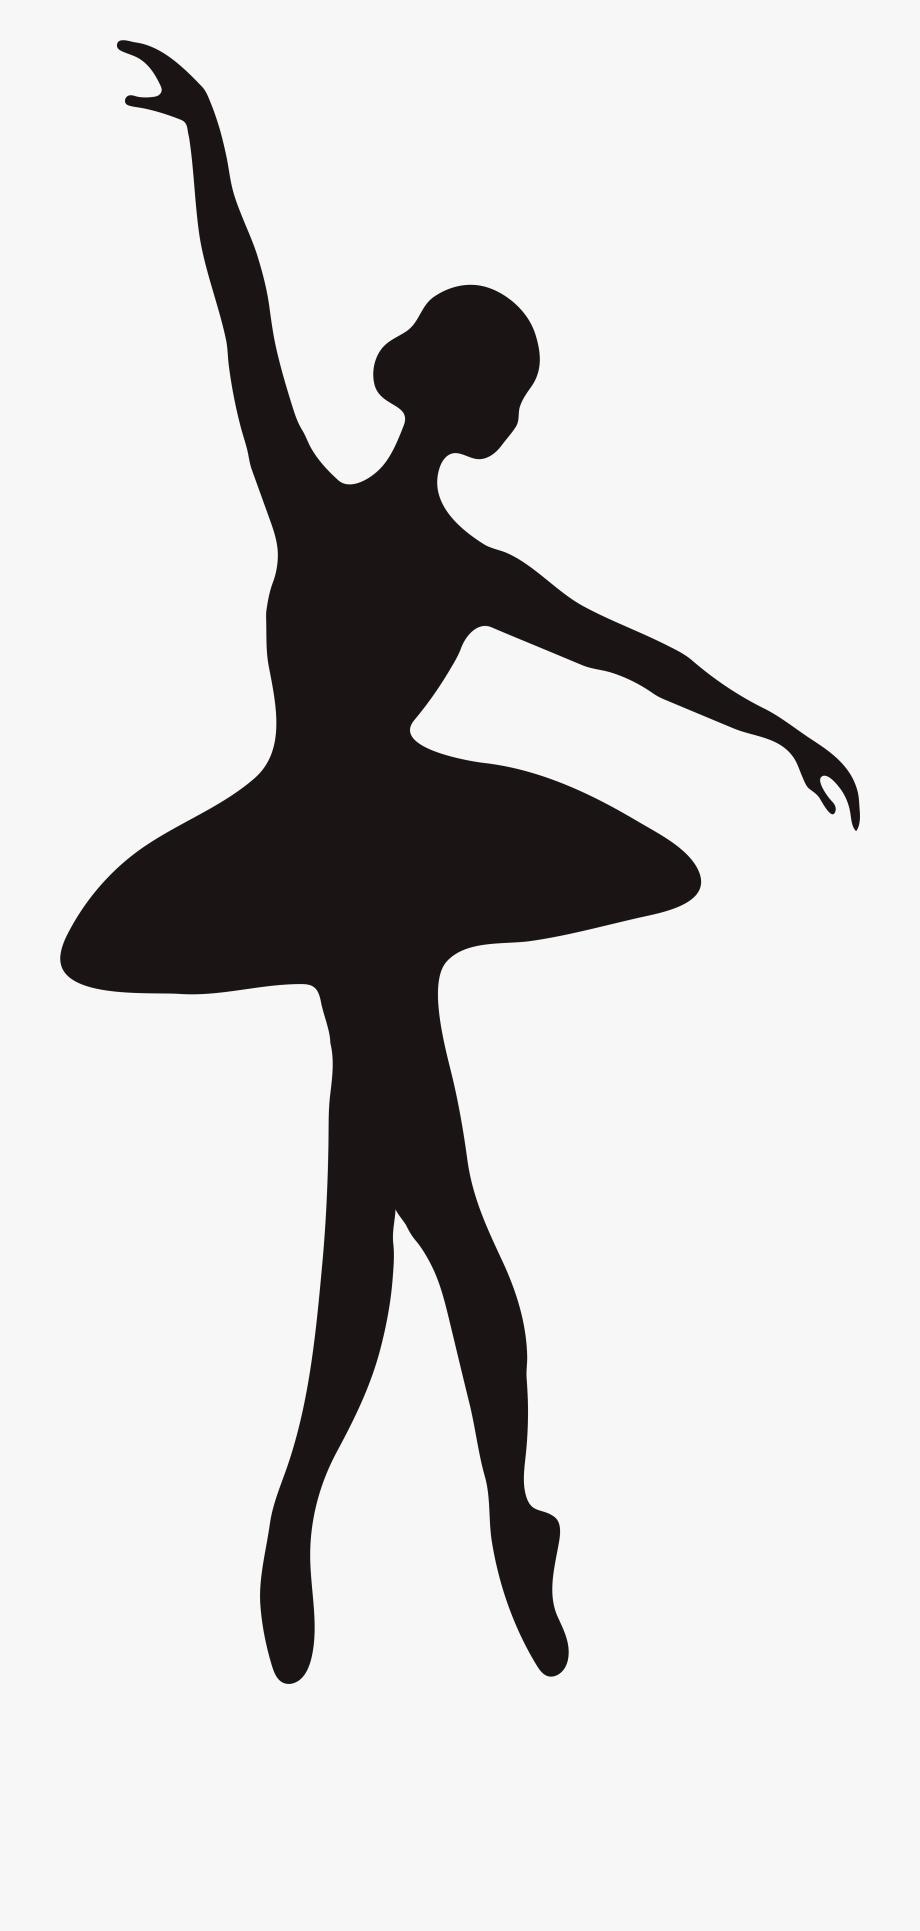 Transparent Dancer Silhouette.